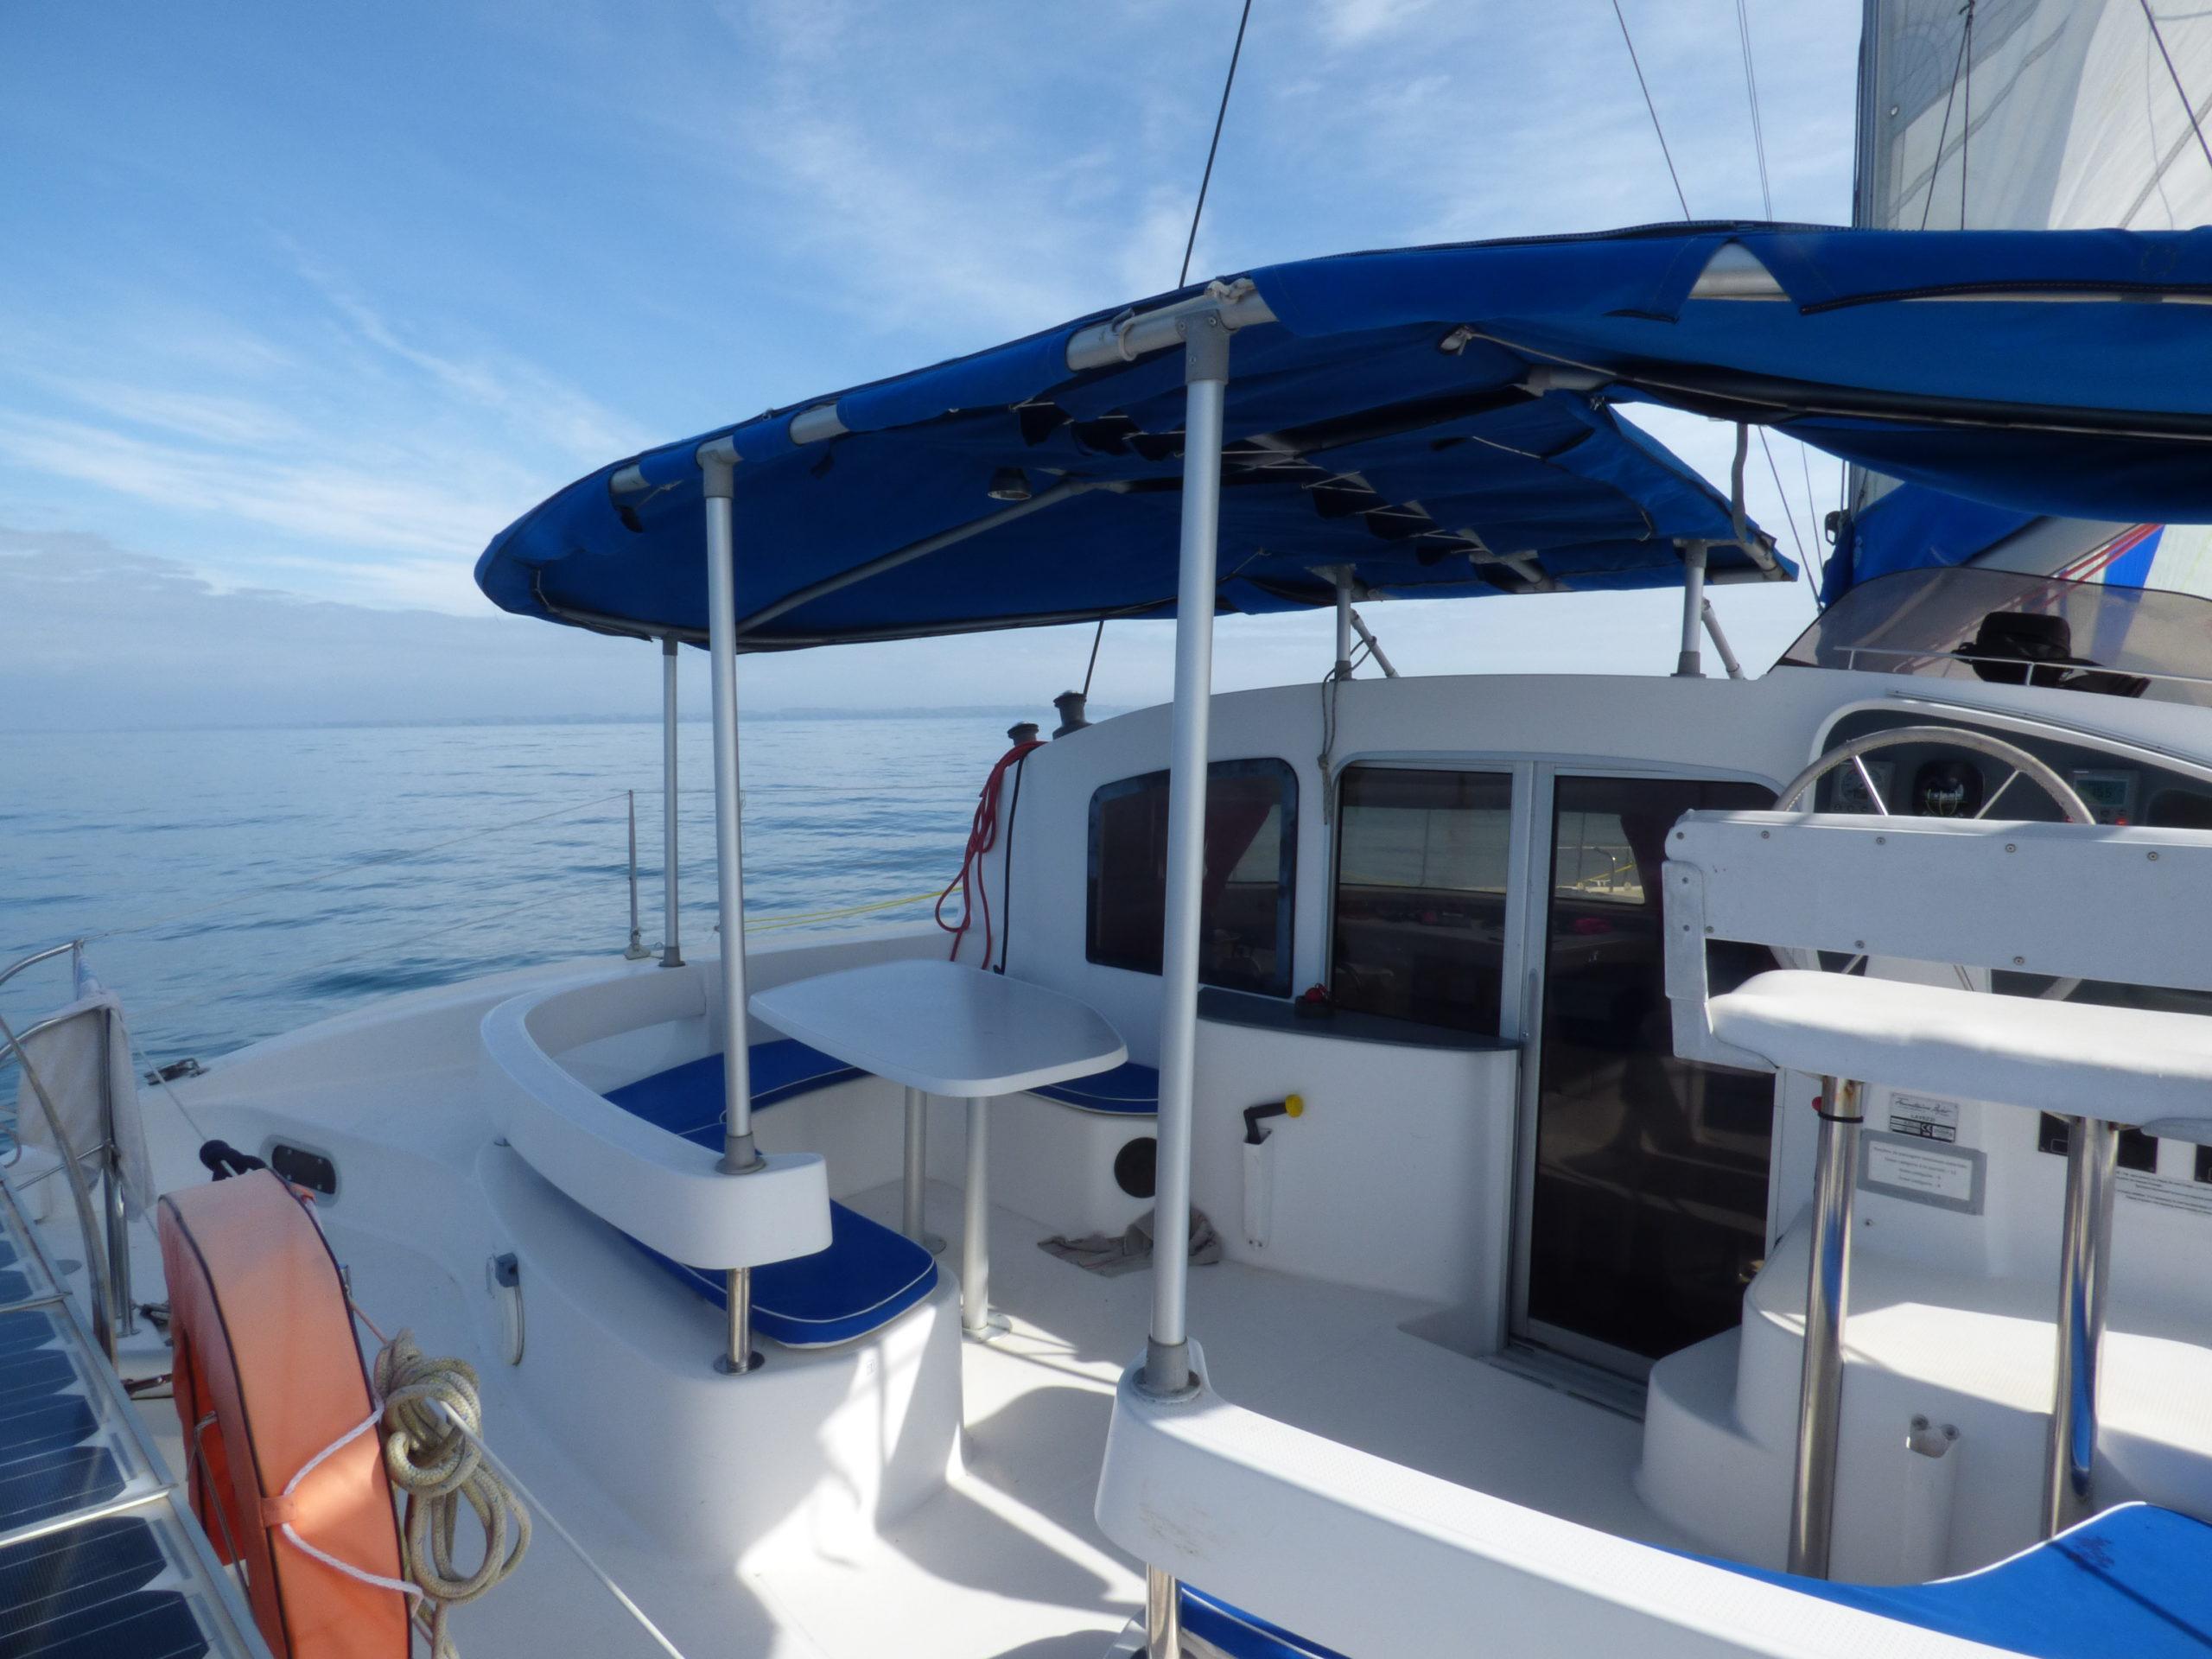 Catamaran La Faute sur Mer